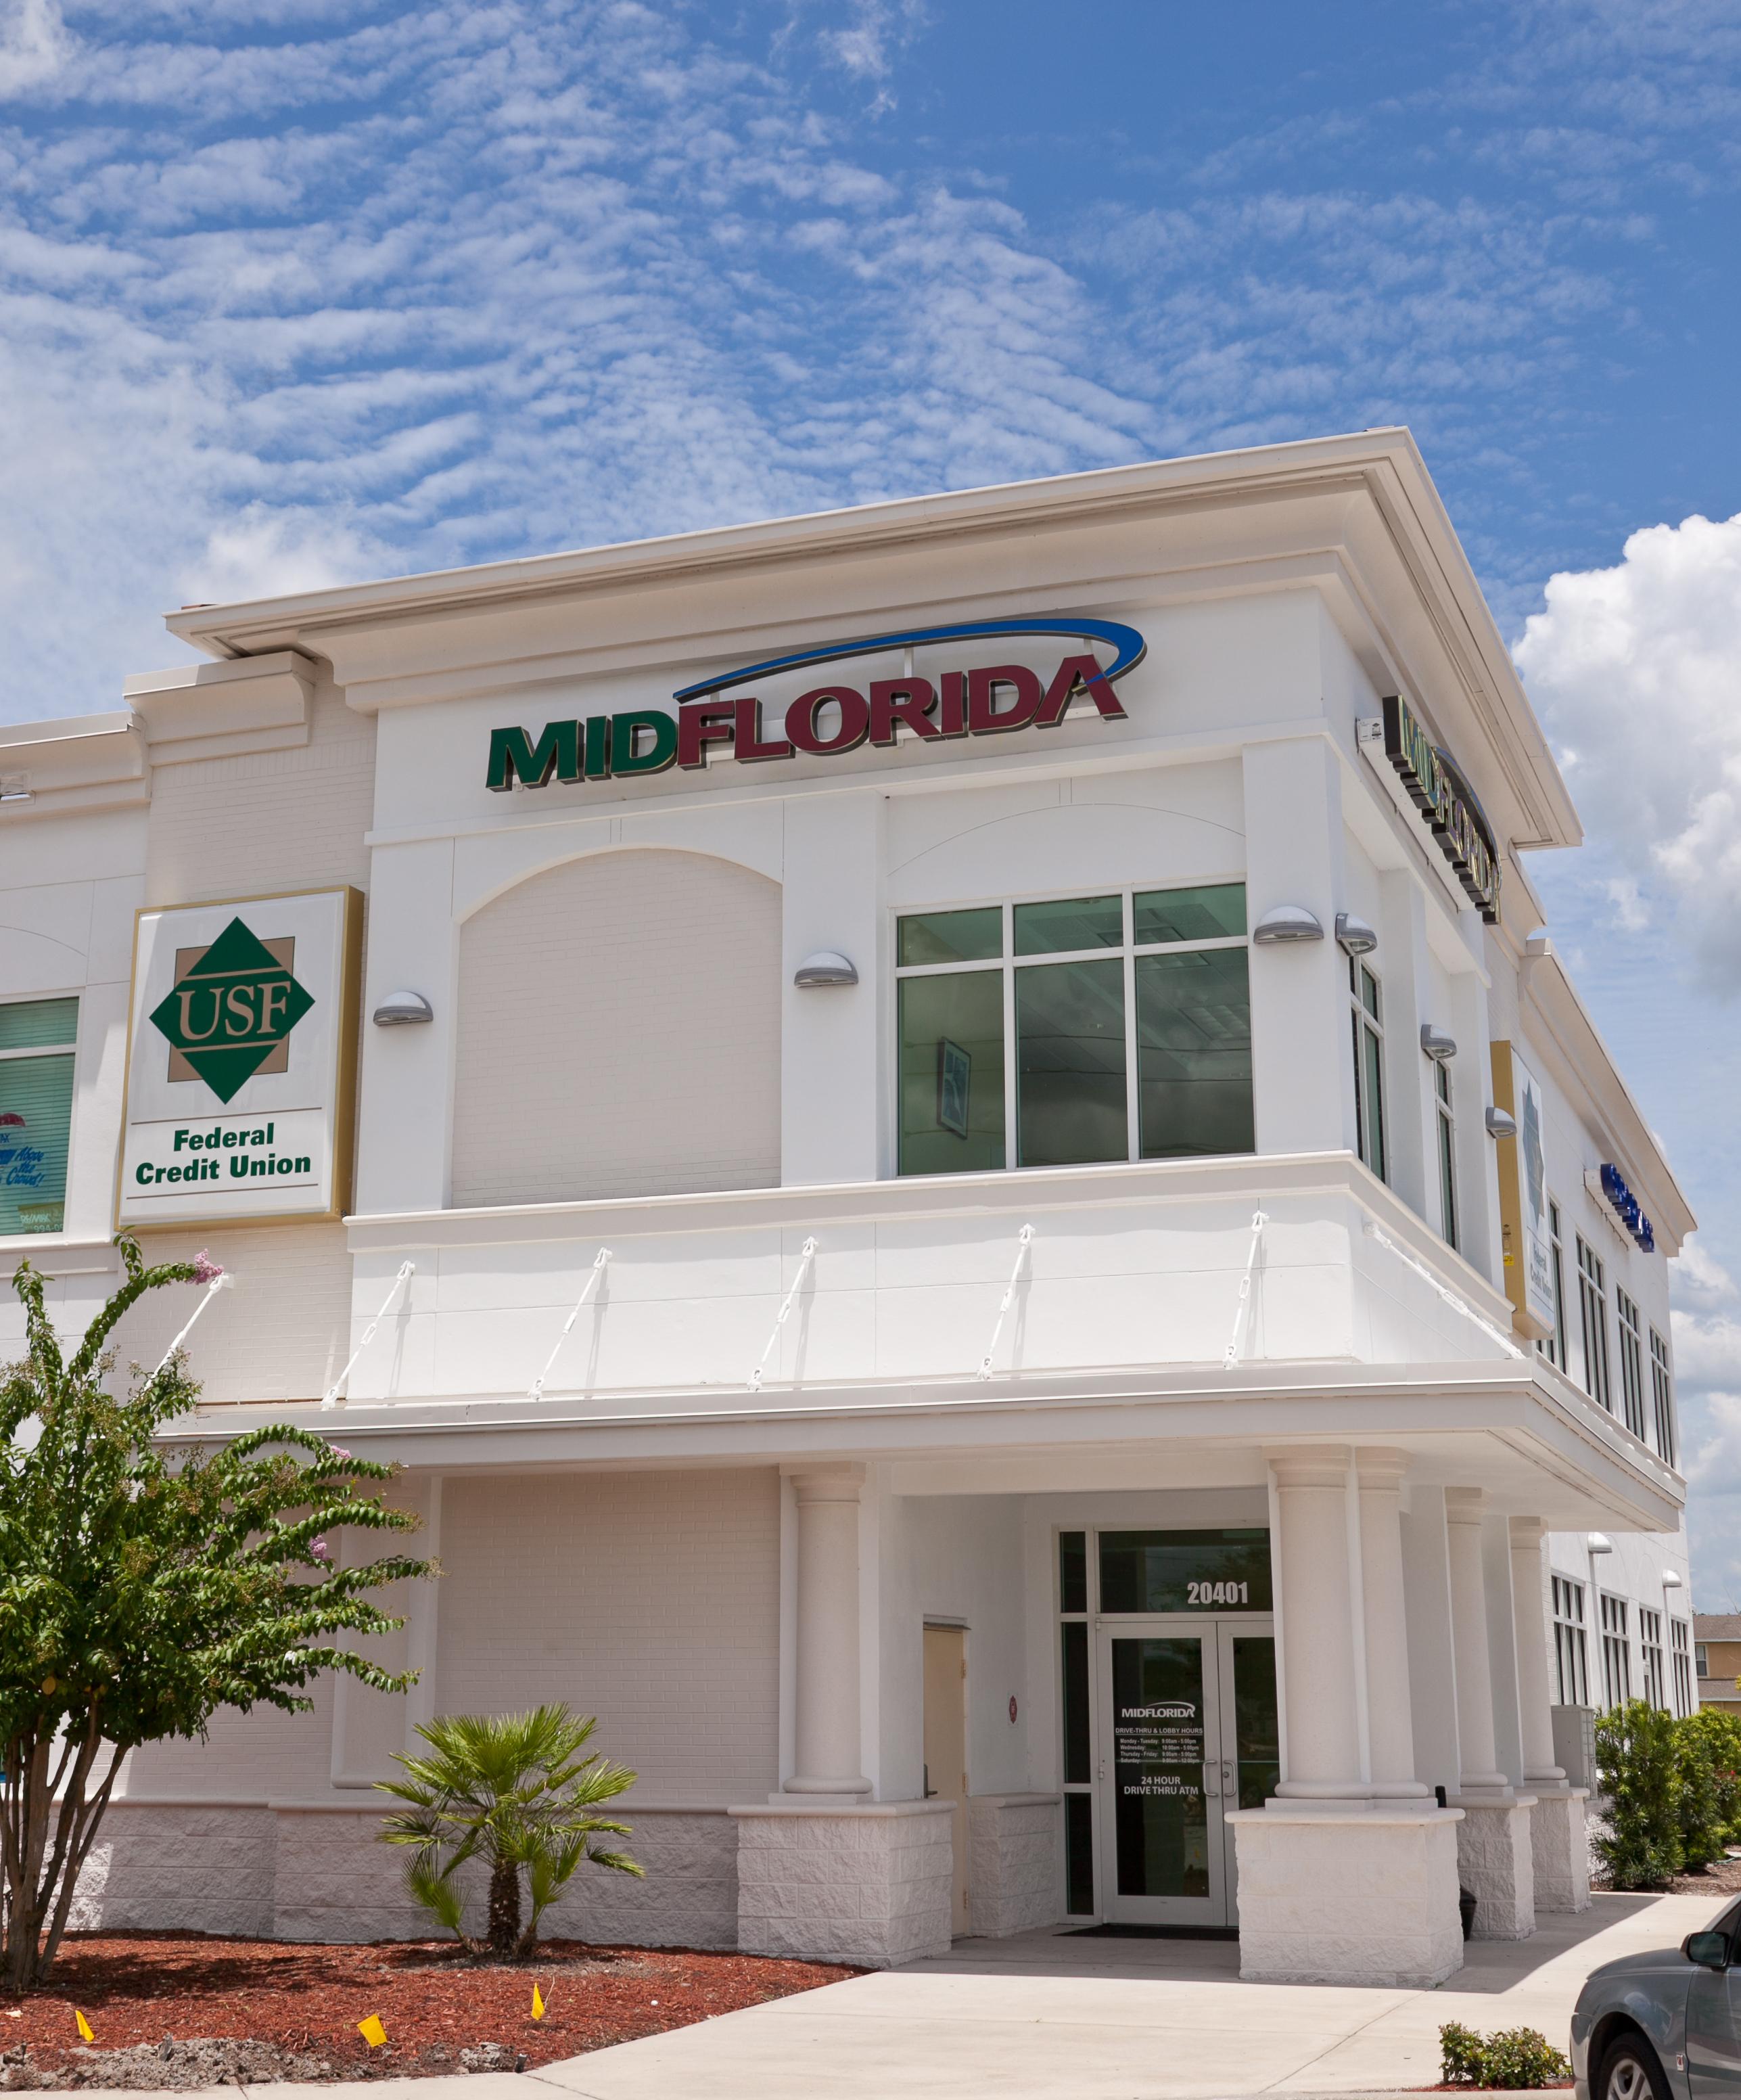 MIDFLORIDA Credit Union image 1